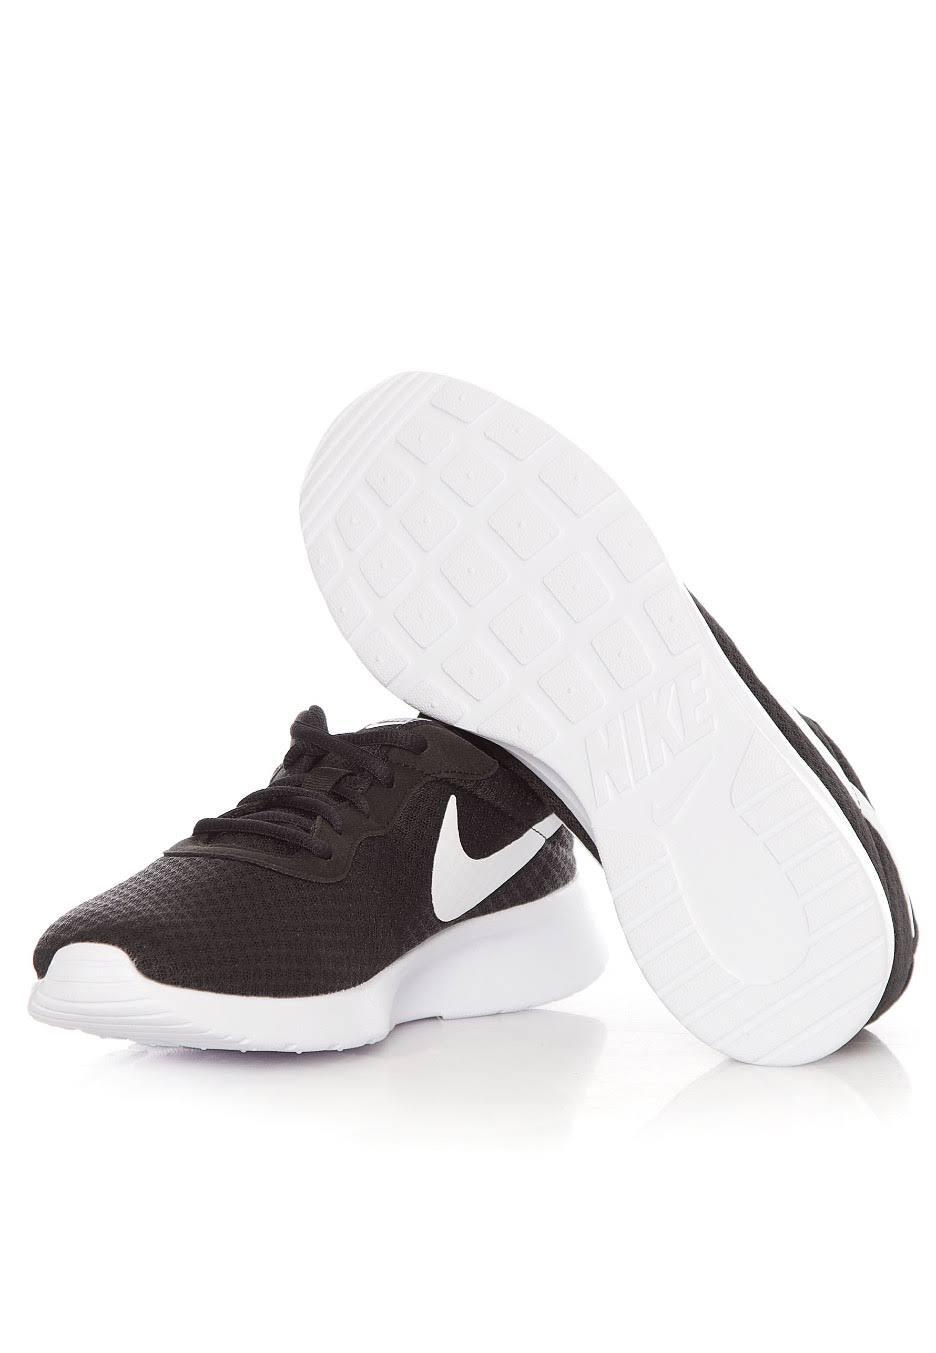 Nike 011 10 Hombre Tanjun Blanco Para Negro Zapatos Tamaño 812654 5 dqCfwd